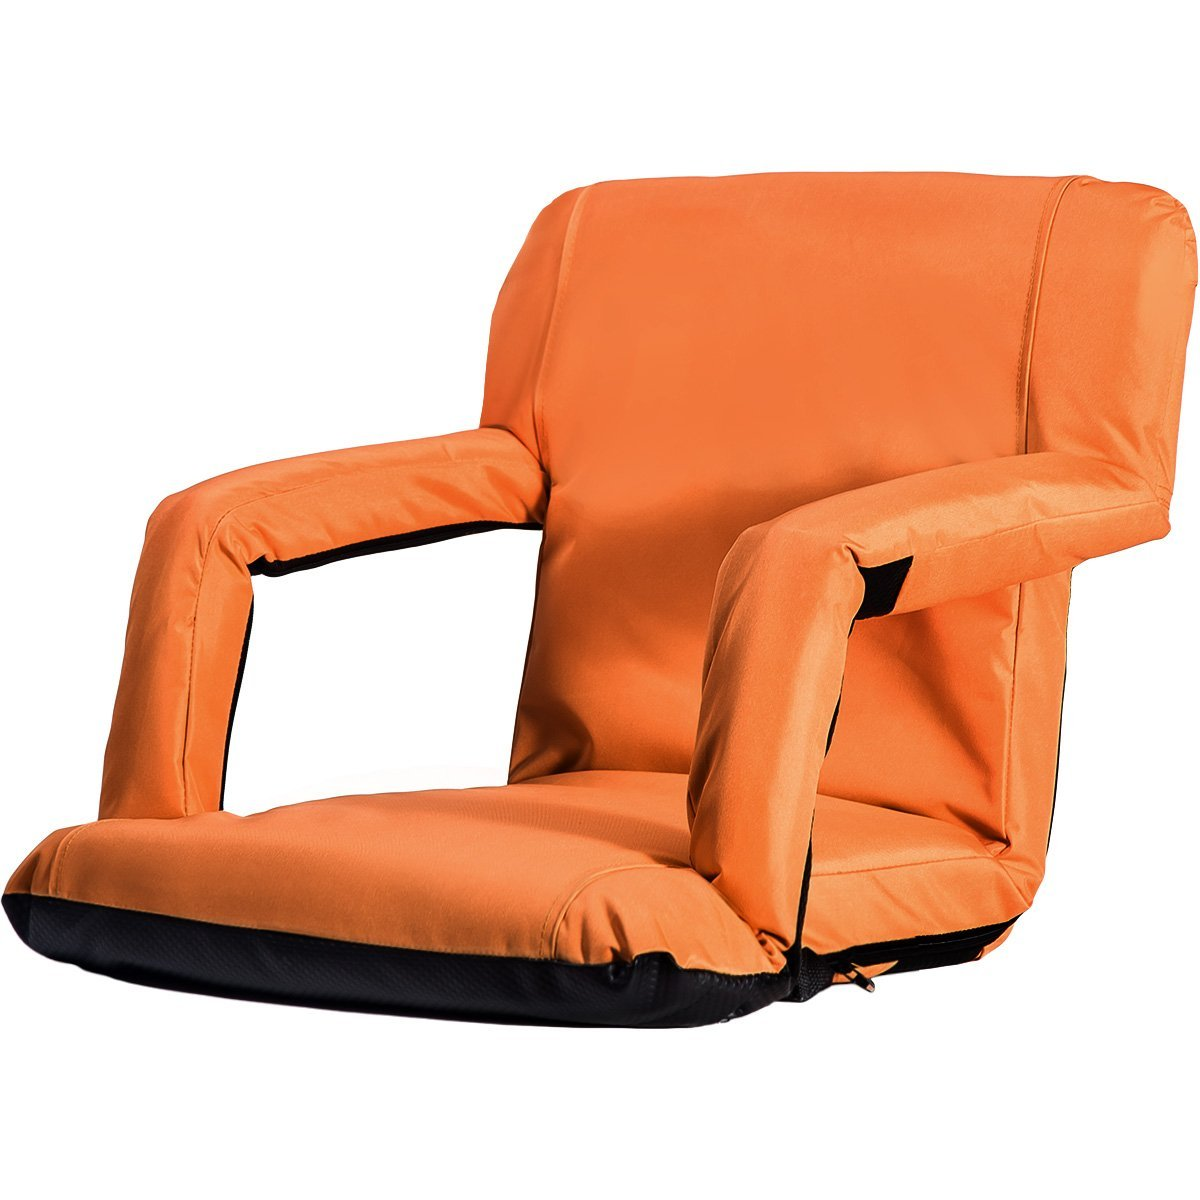 Merax Reclining Stadium Seat Chair Bleacher Chair Portable Reclining Seat Folding with Armrest by Merax